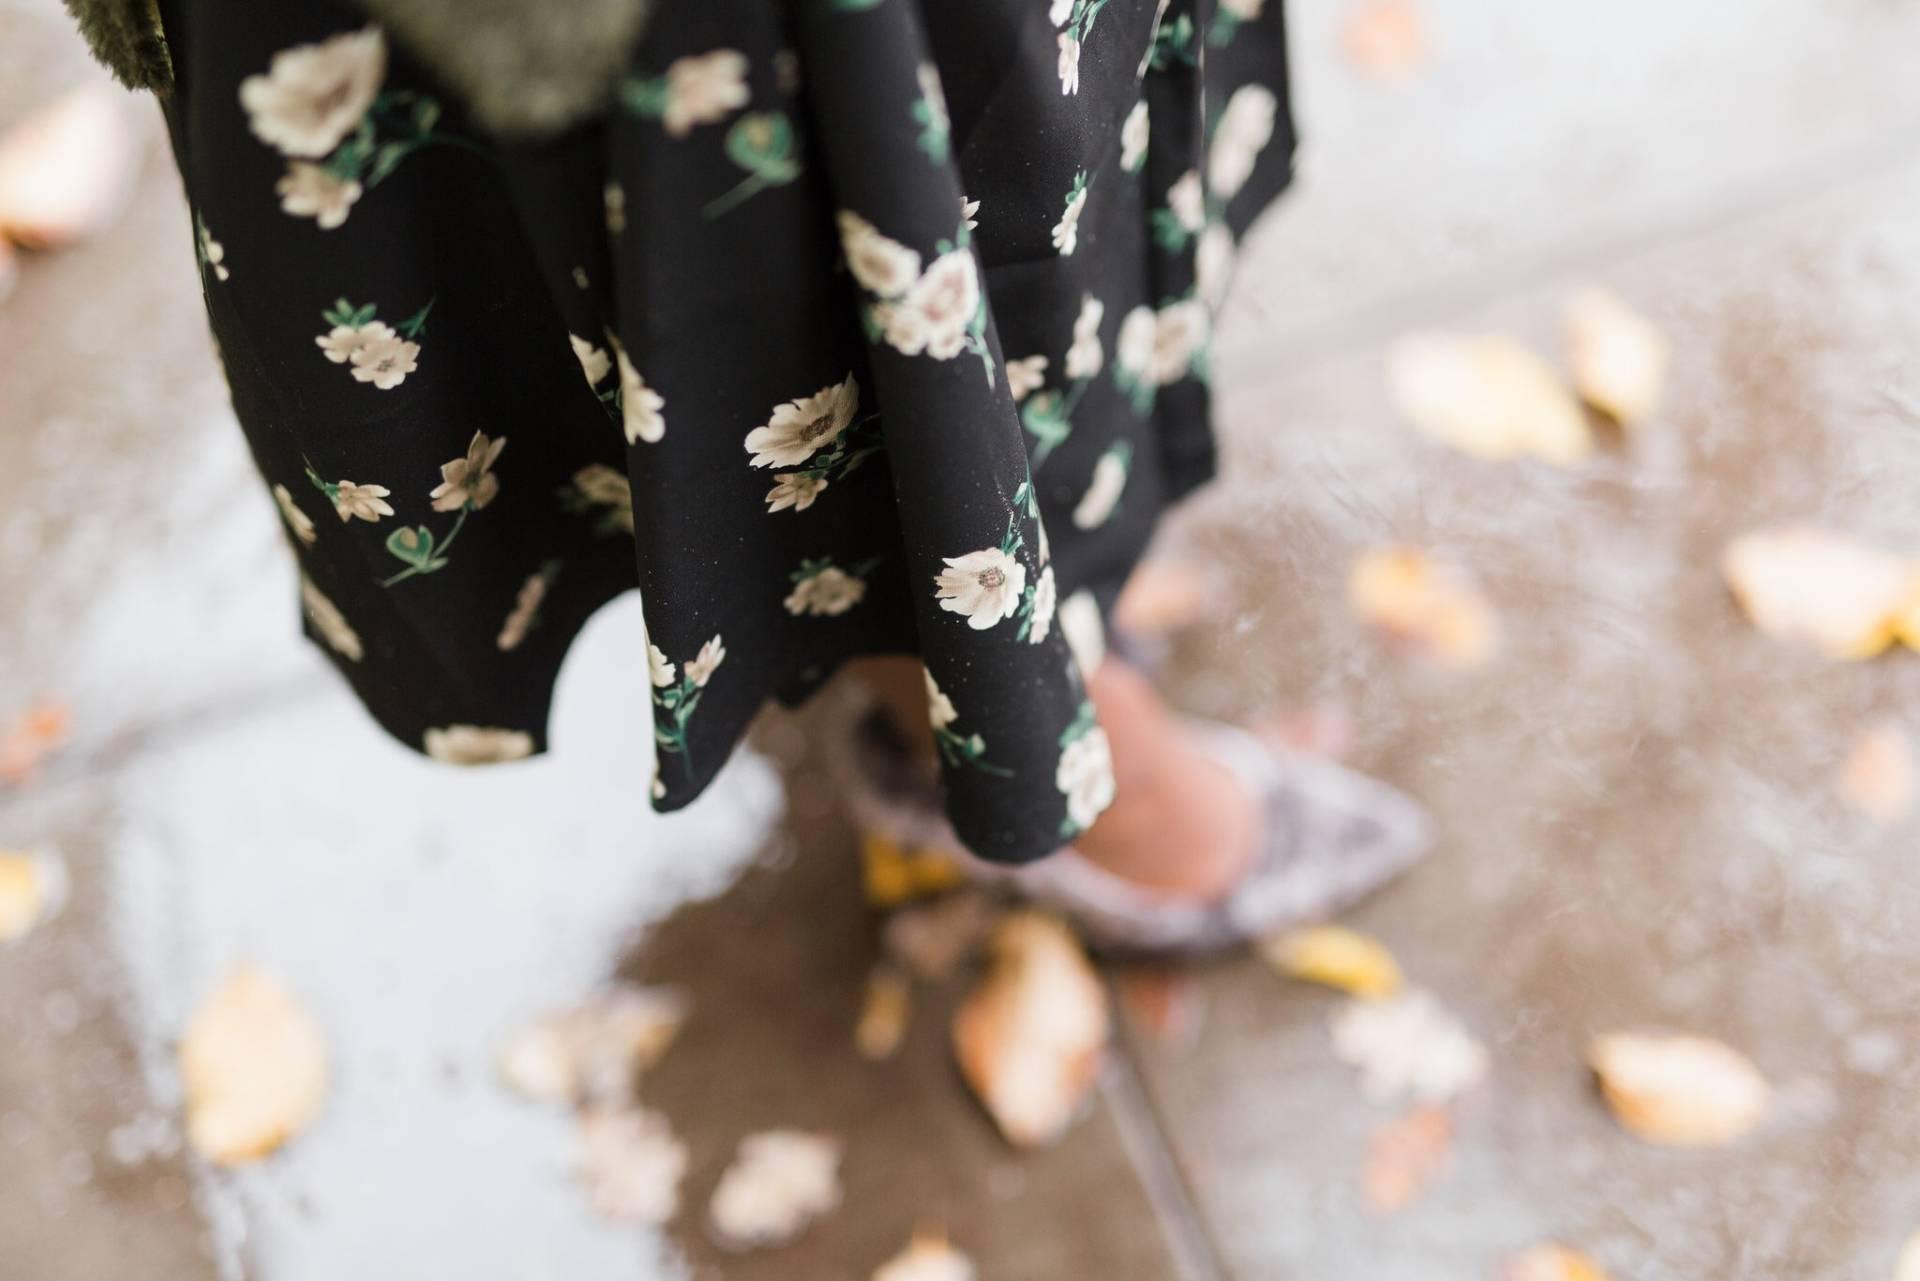 floral-wrap-dress- detail shot